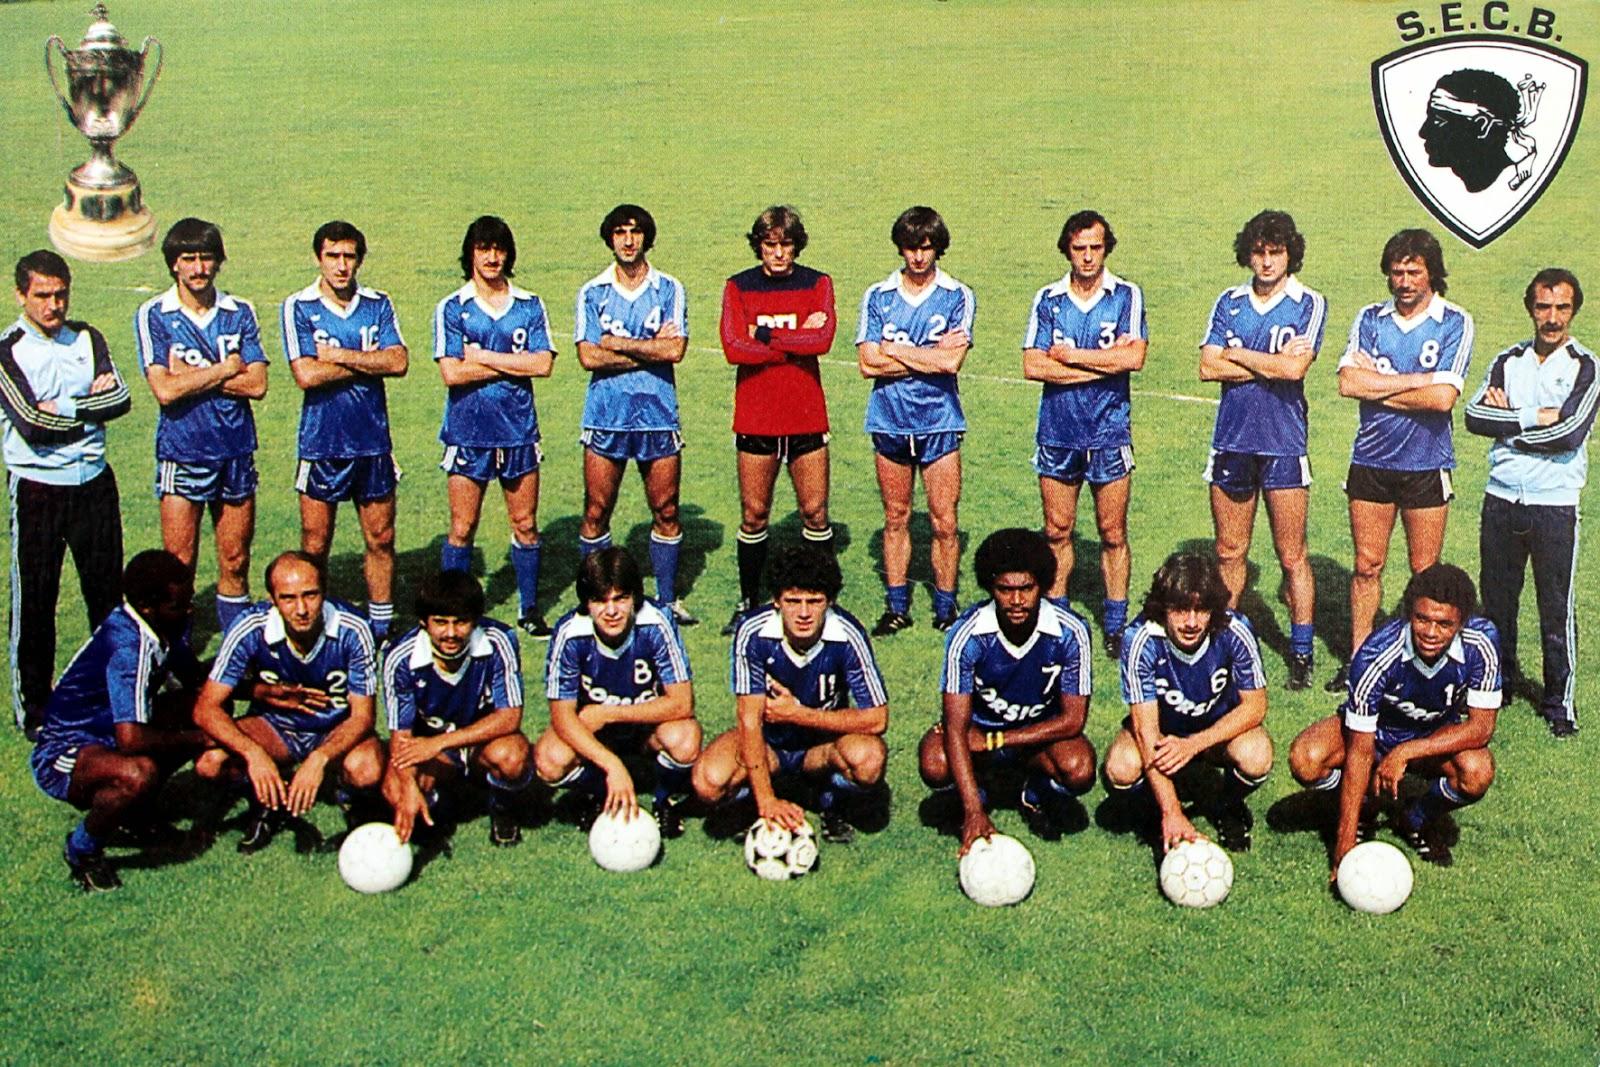 S e c bastia 1981 coupe de france the vintage football club - Coupe de france 2015 foot ...